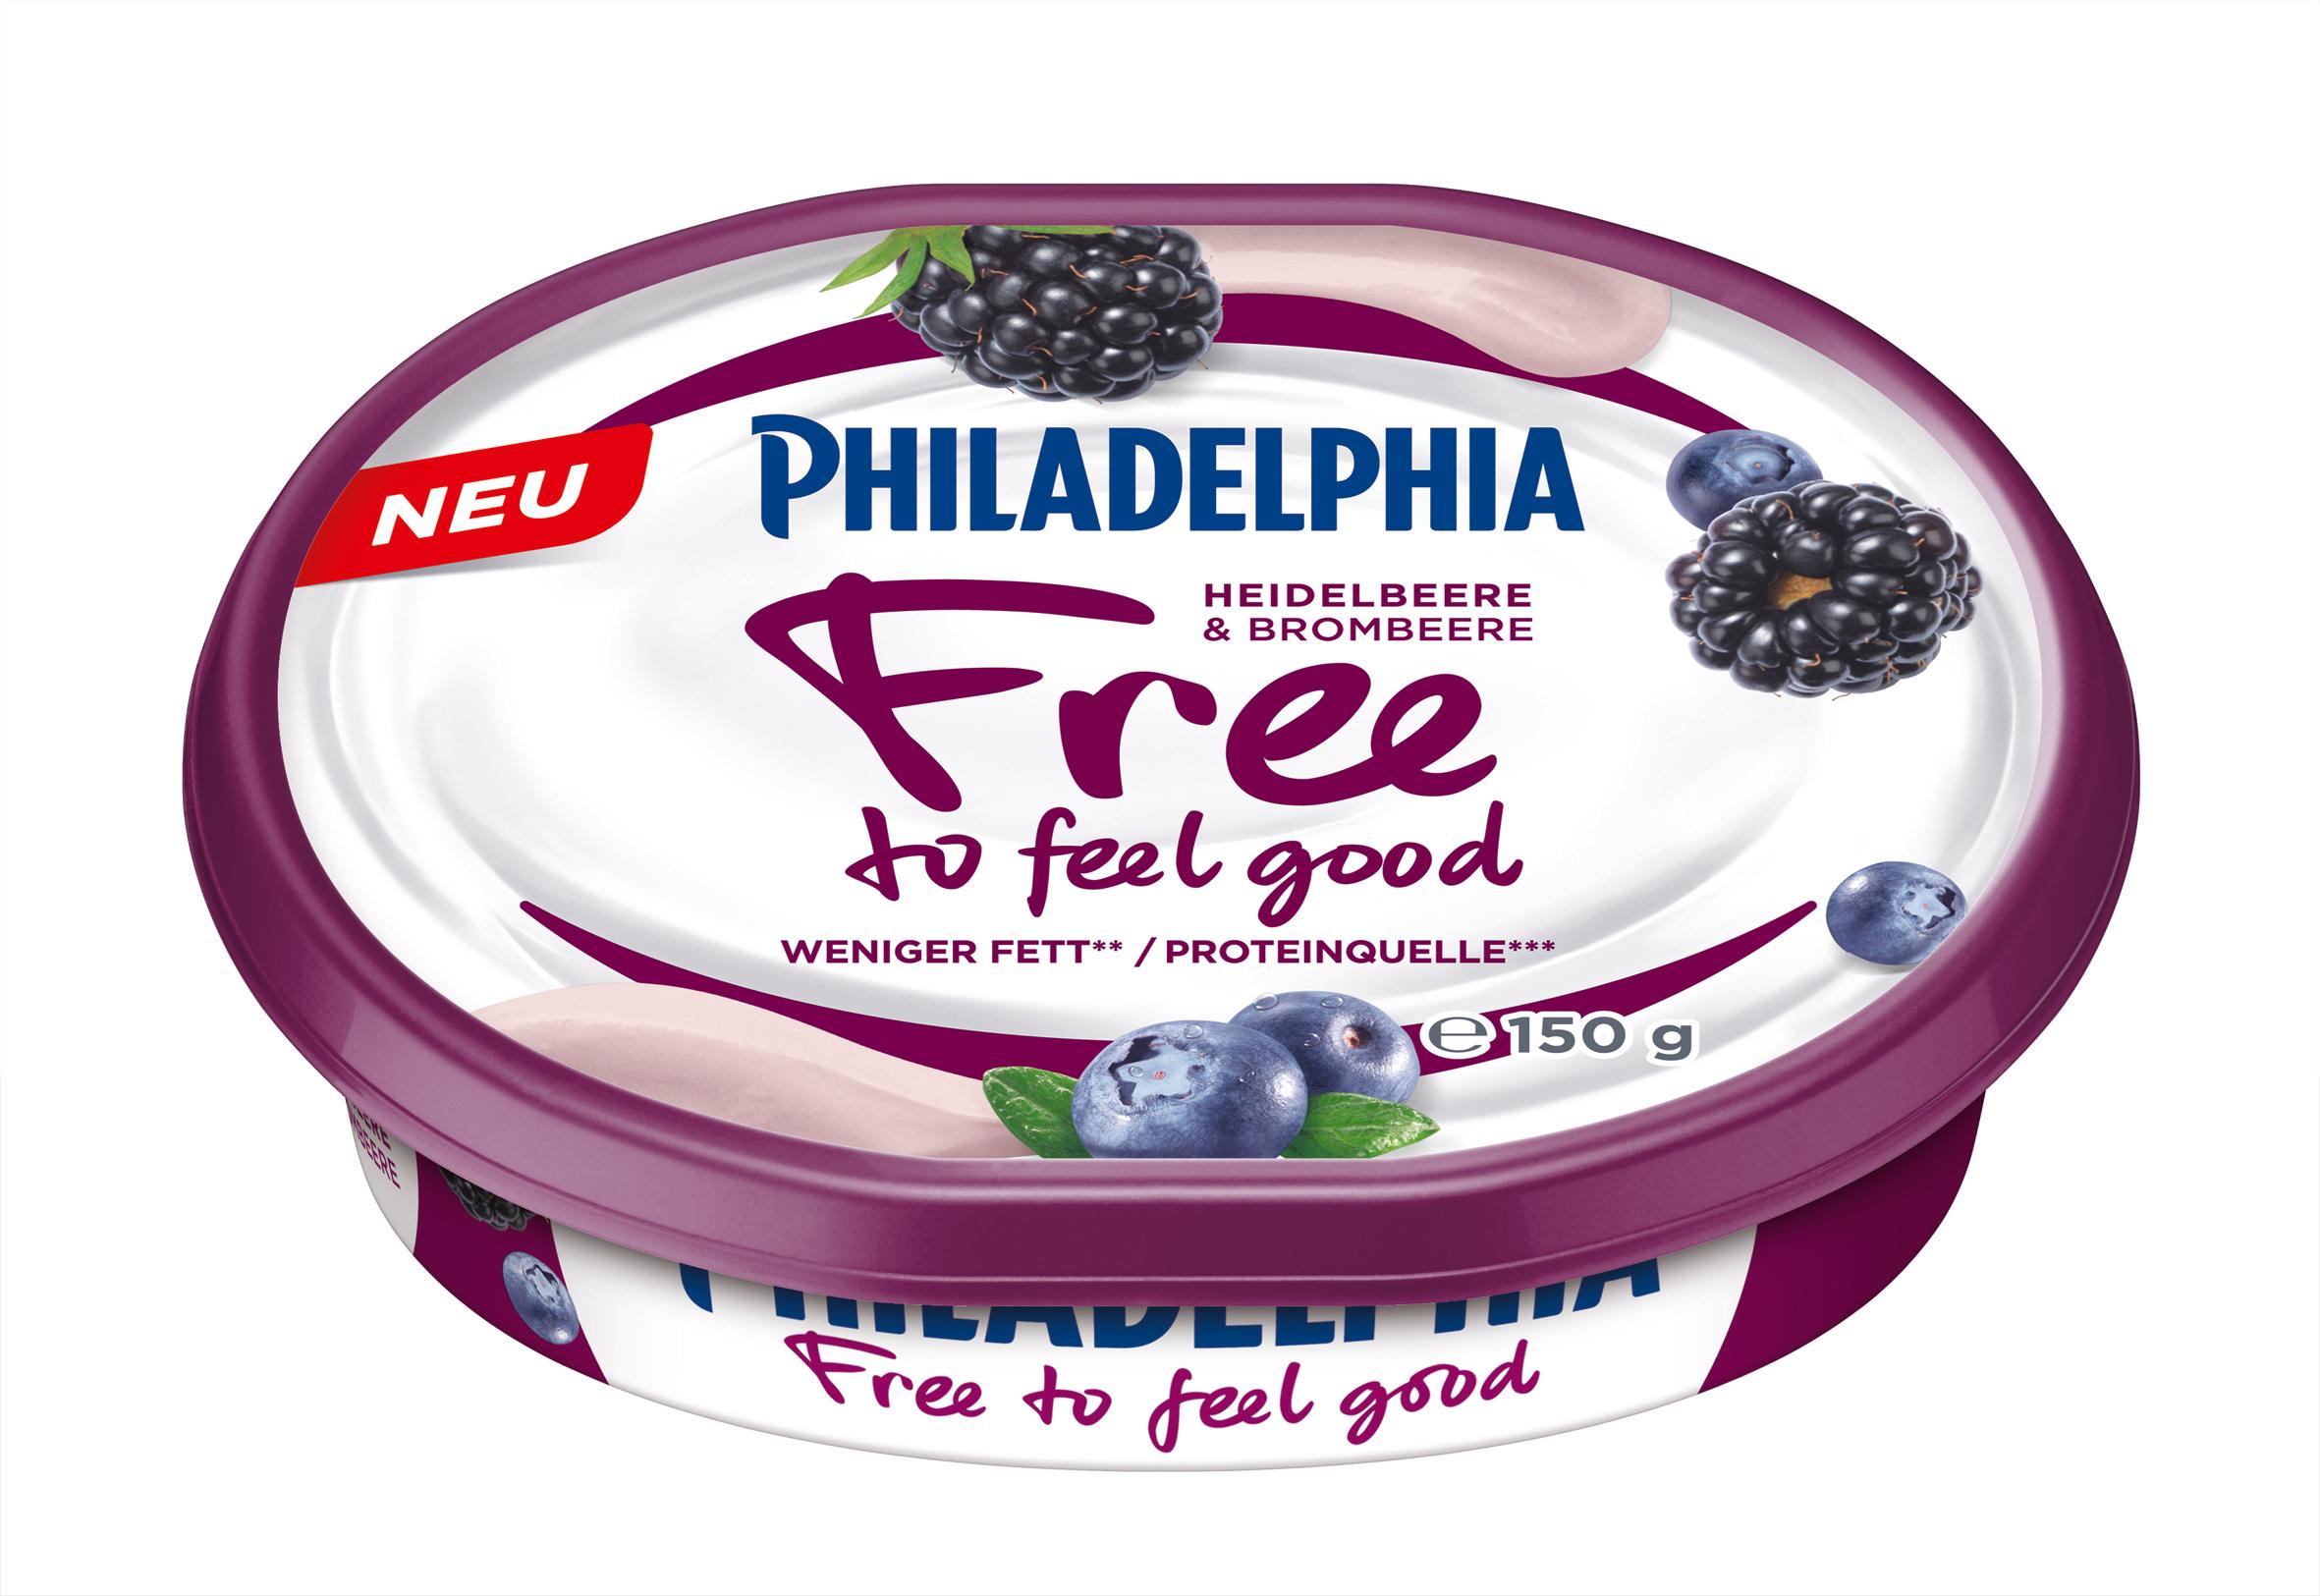 Philadelphia Free to feel good Heidelbeere